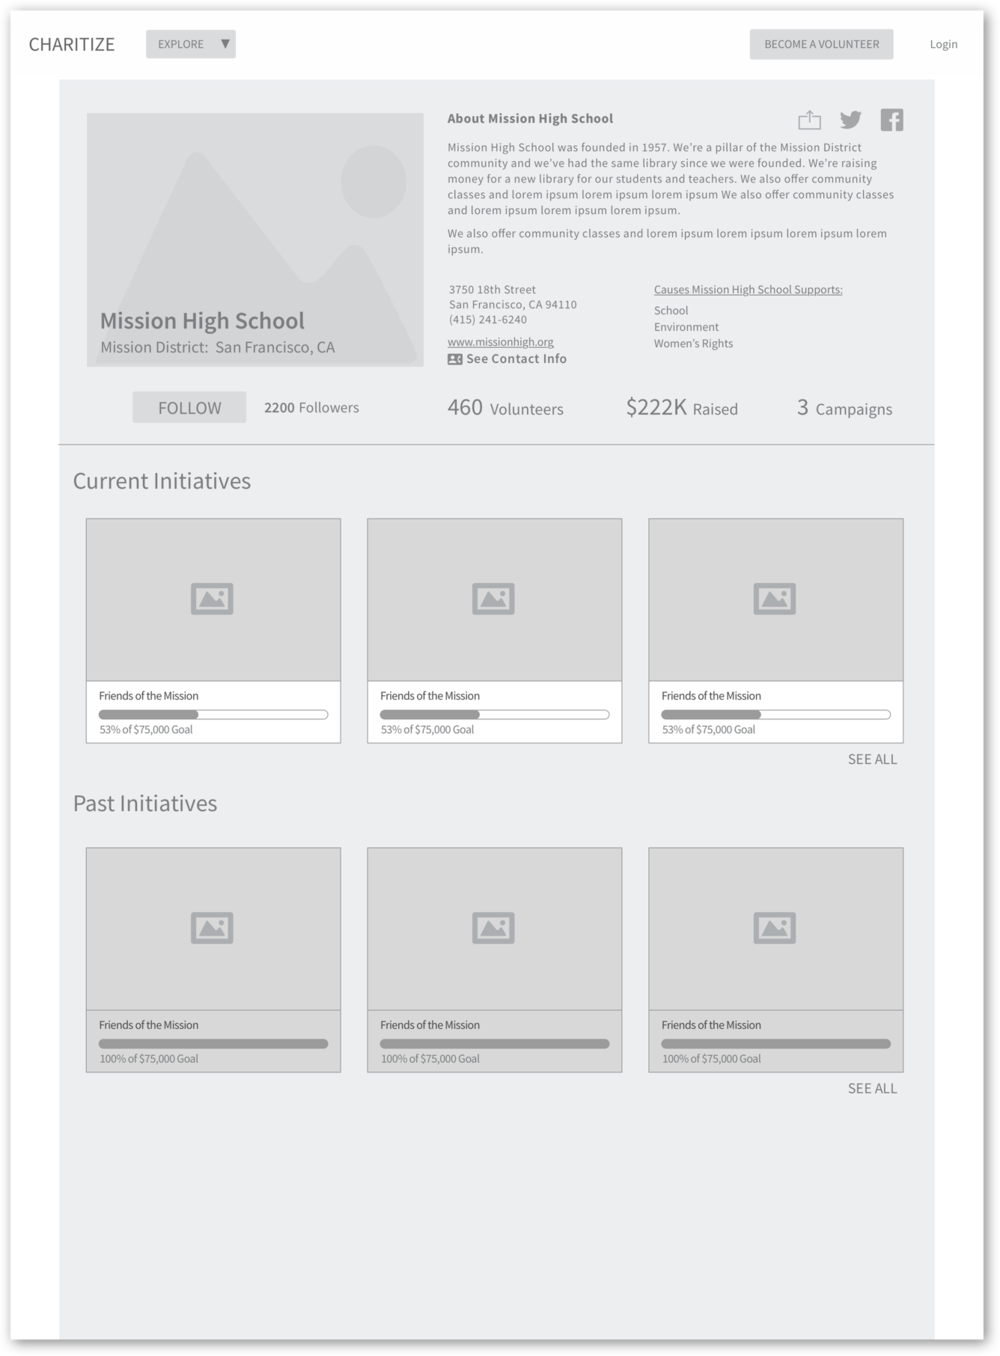 Organization Page Public